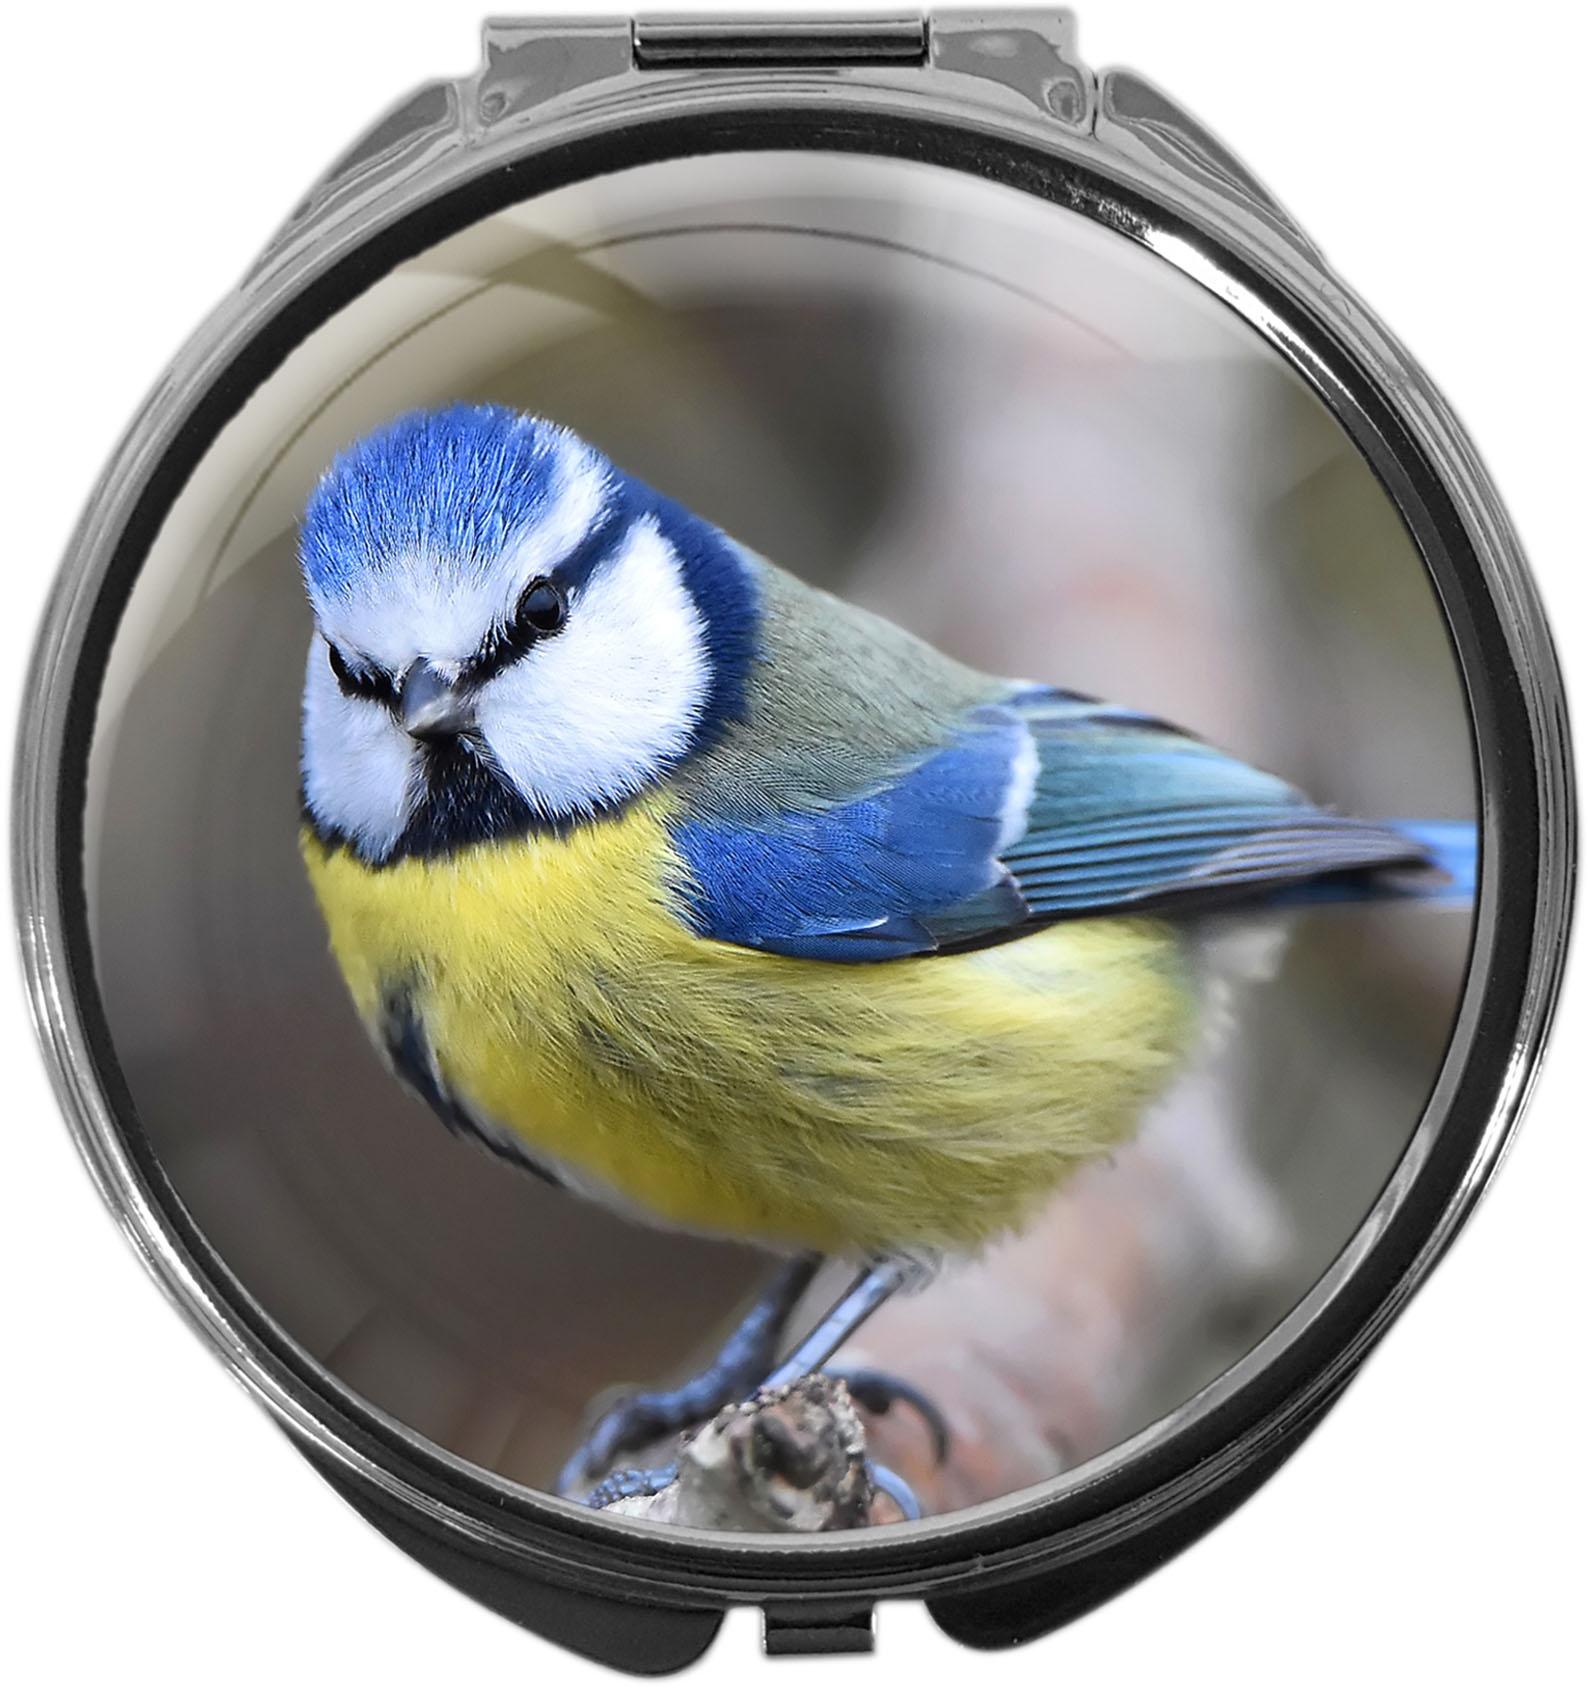 Pillendose / Meise / Vögel